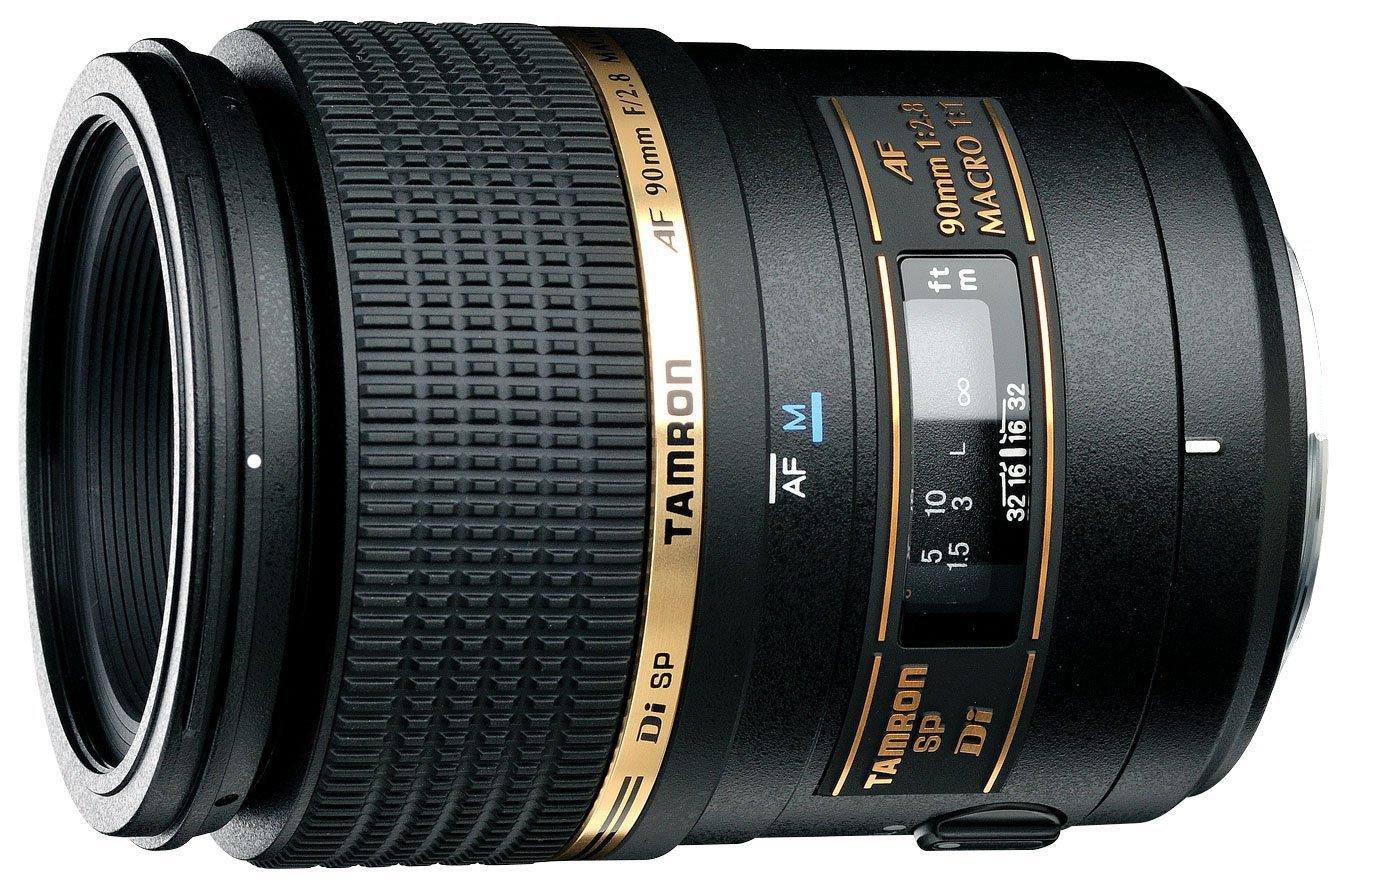 Tamron SP AF 90mm F/2.8 Di Macro 1:1 Lens for Nikon: Amazon.co.uk: Camera &  Photo